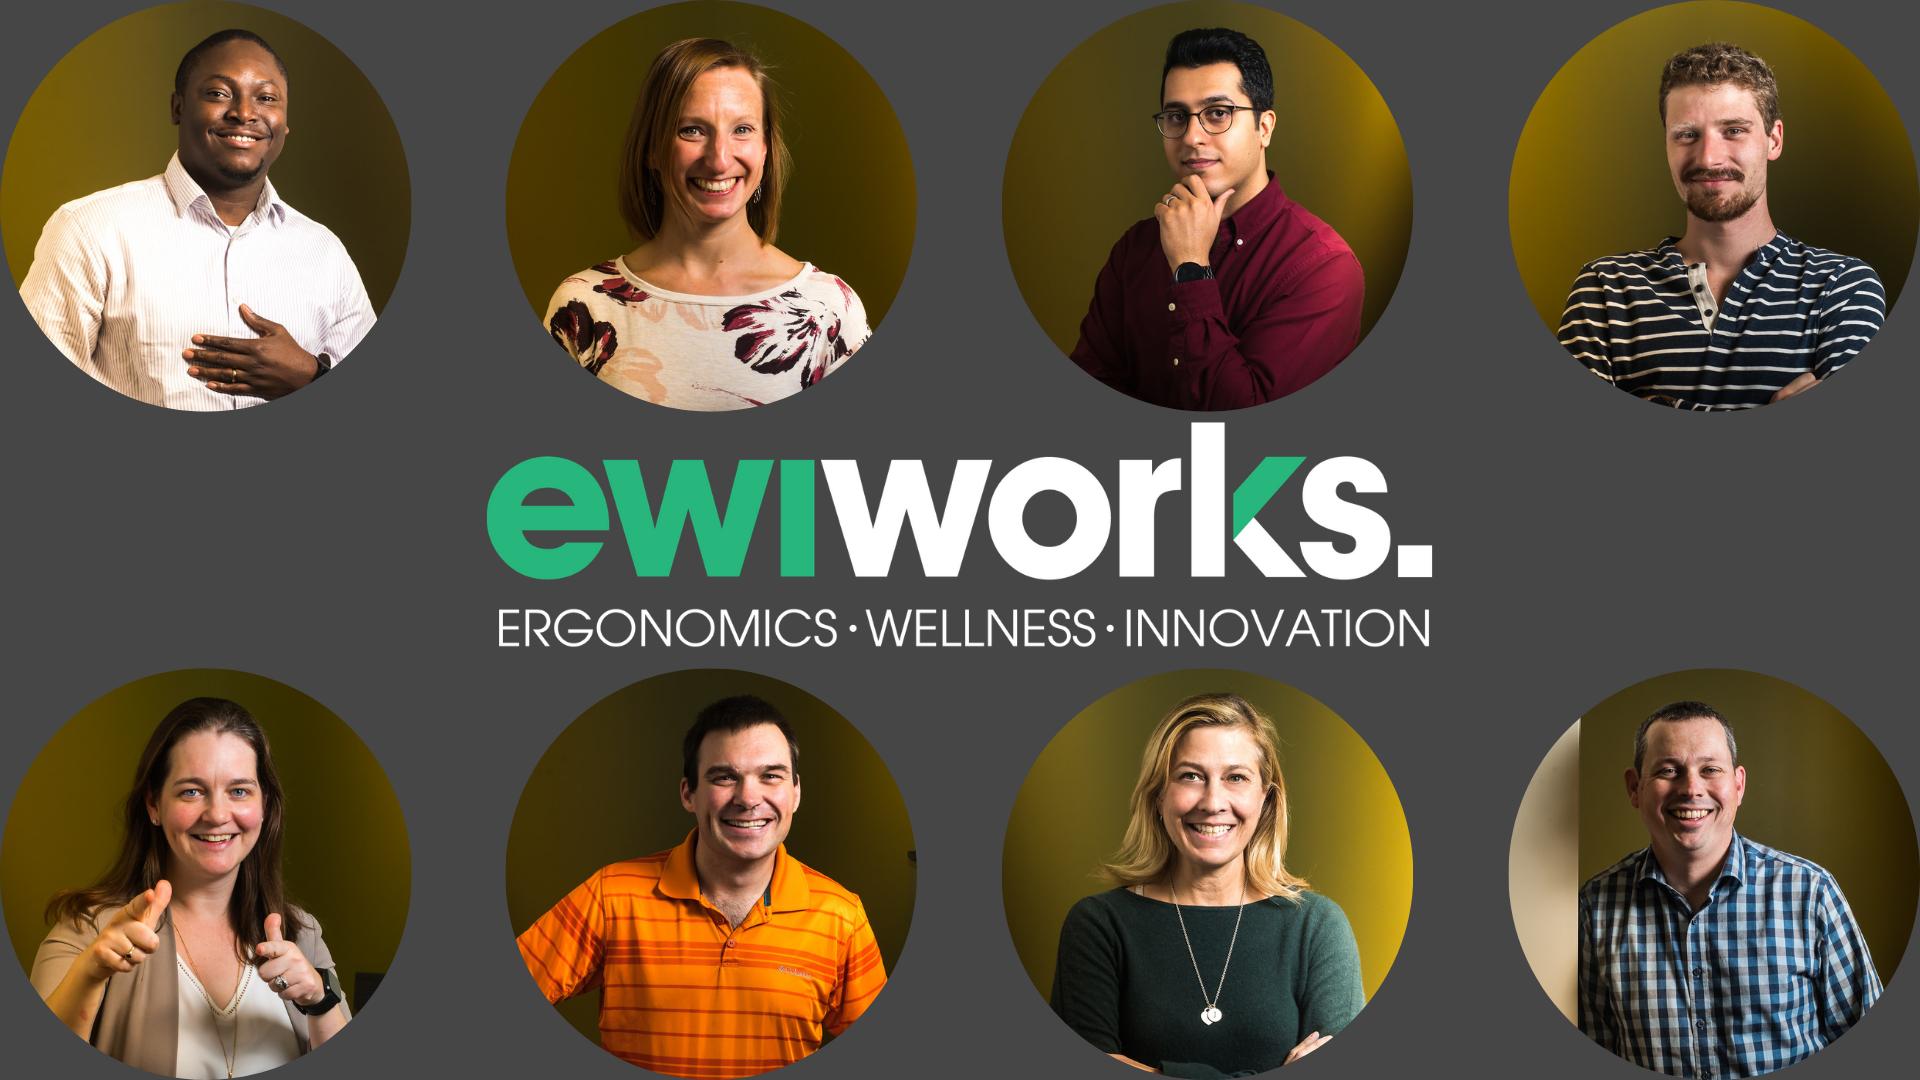 EWI Works Logo and Staff Headshots